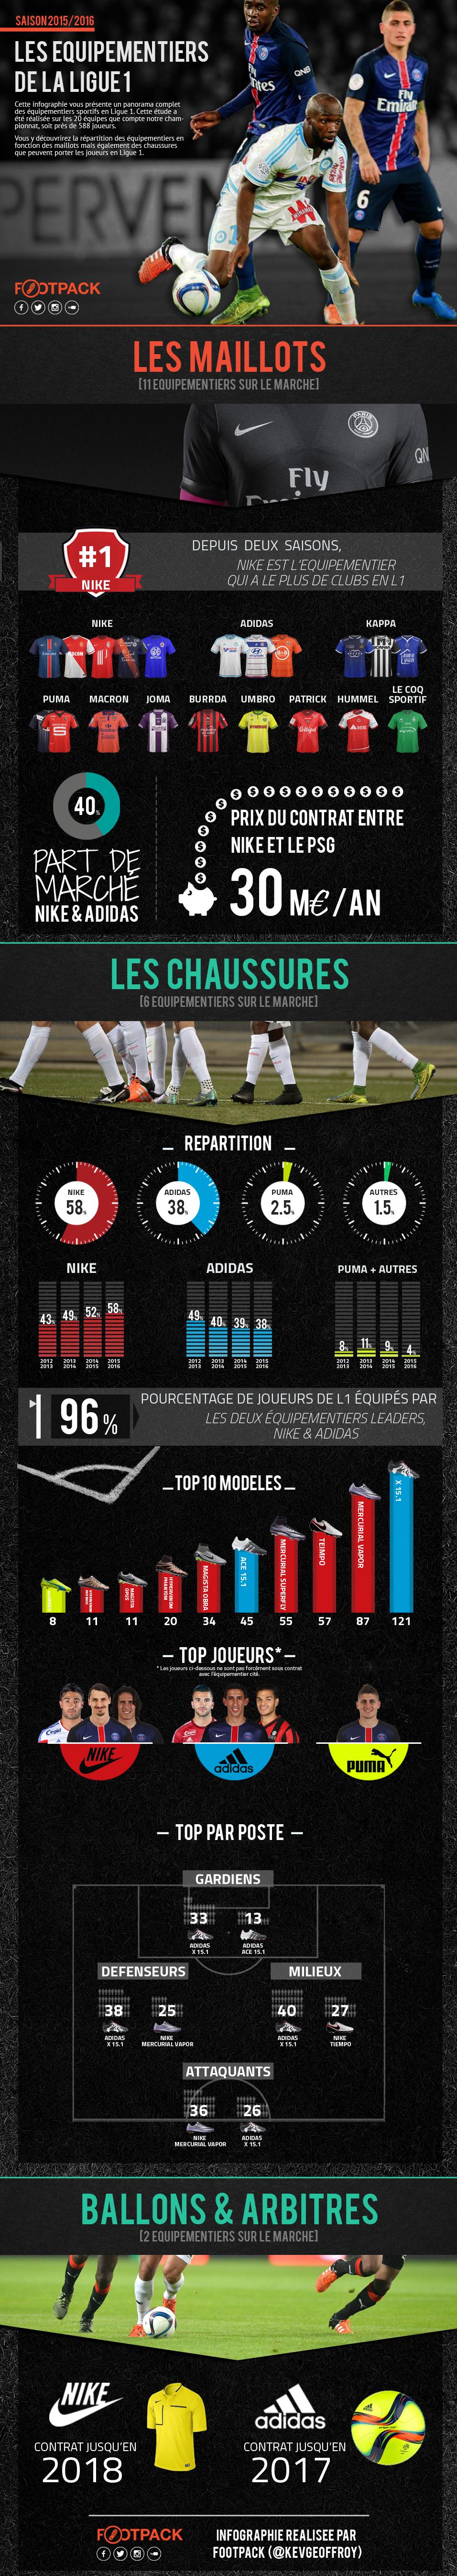 Infographie Footpack équipements Ligue 1